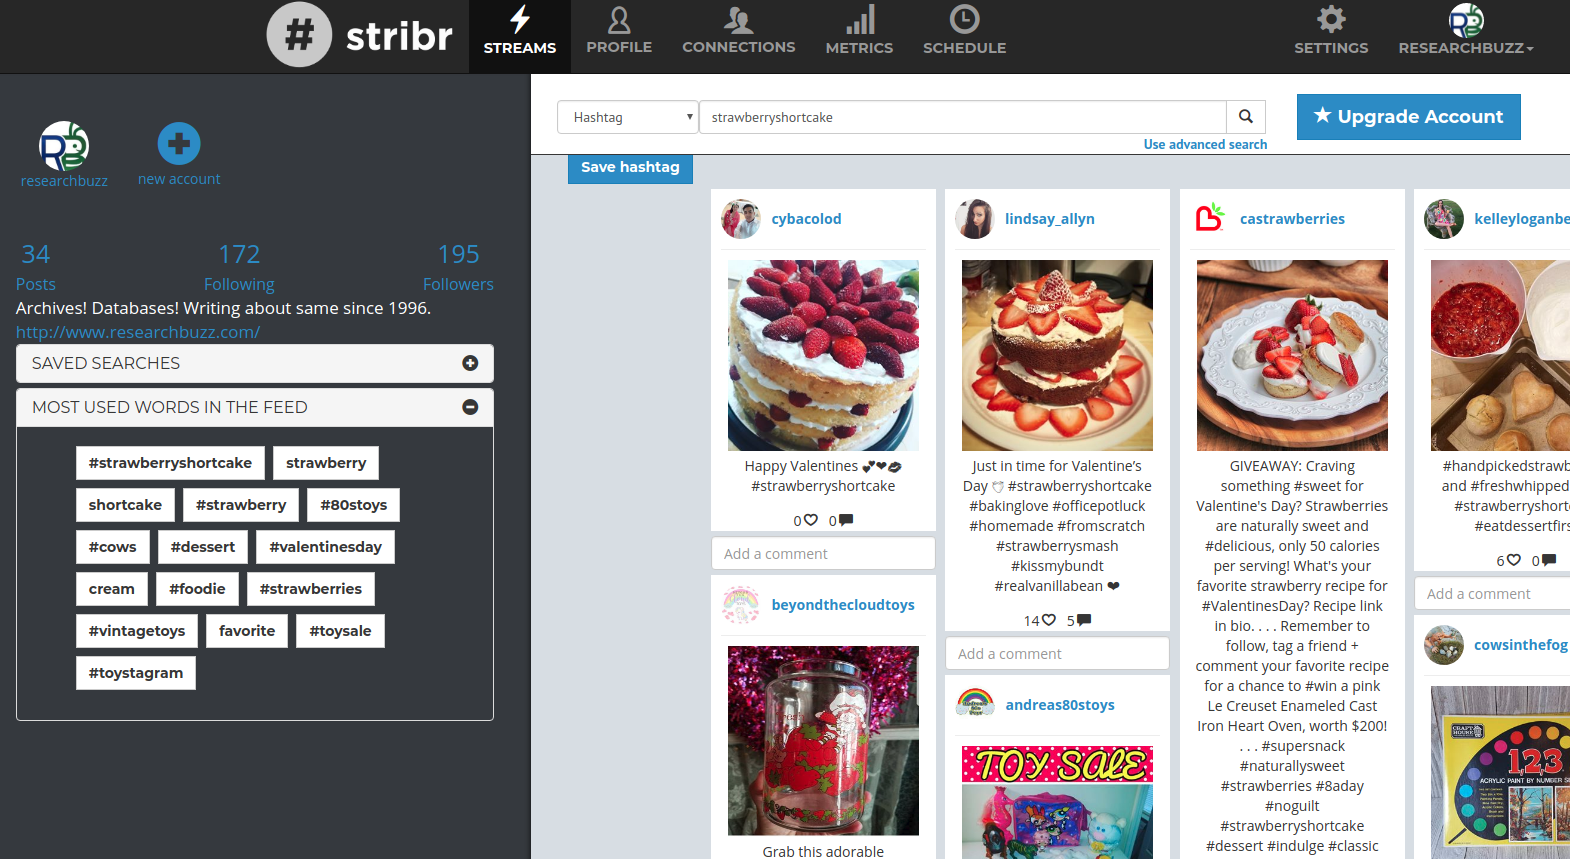 Following #strawberryshortcake on Instagram.